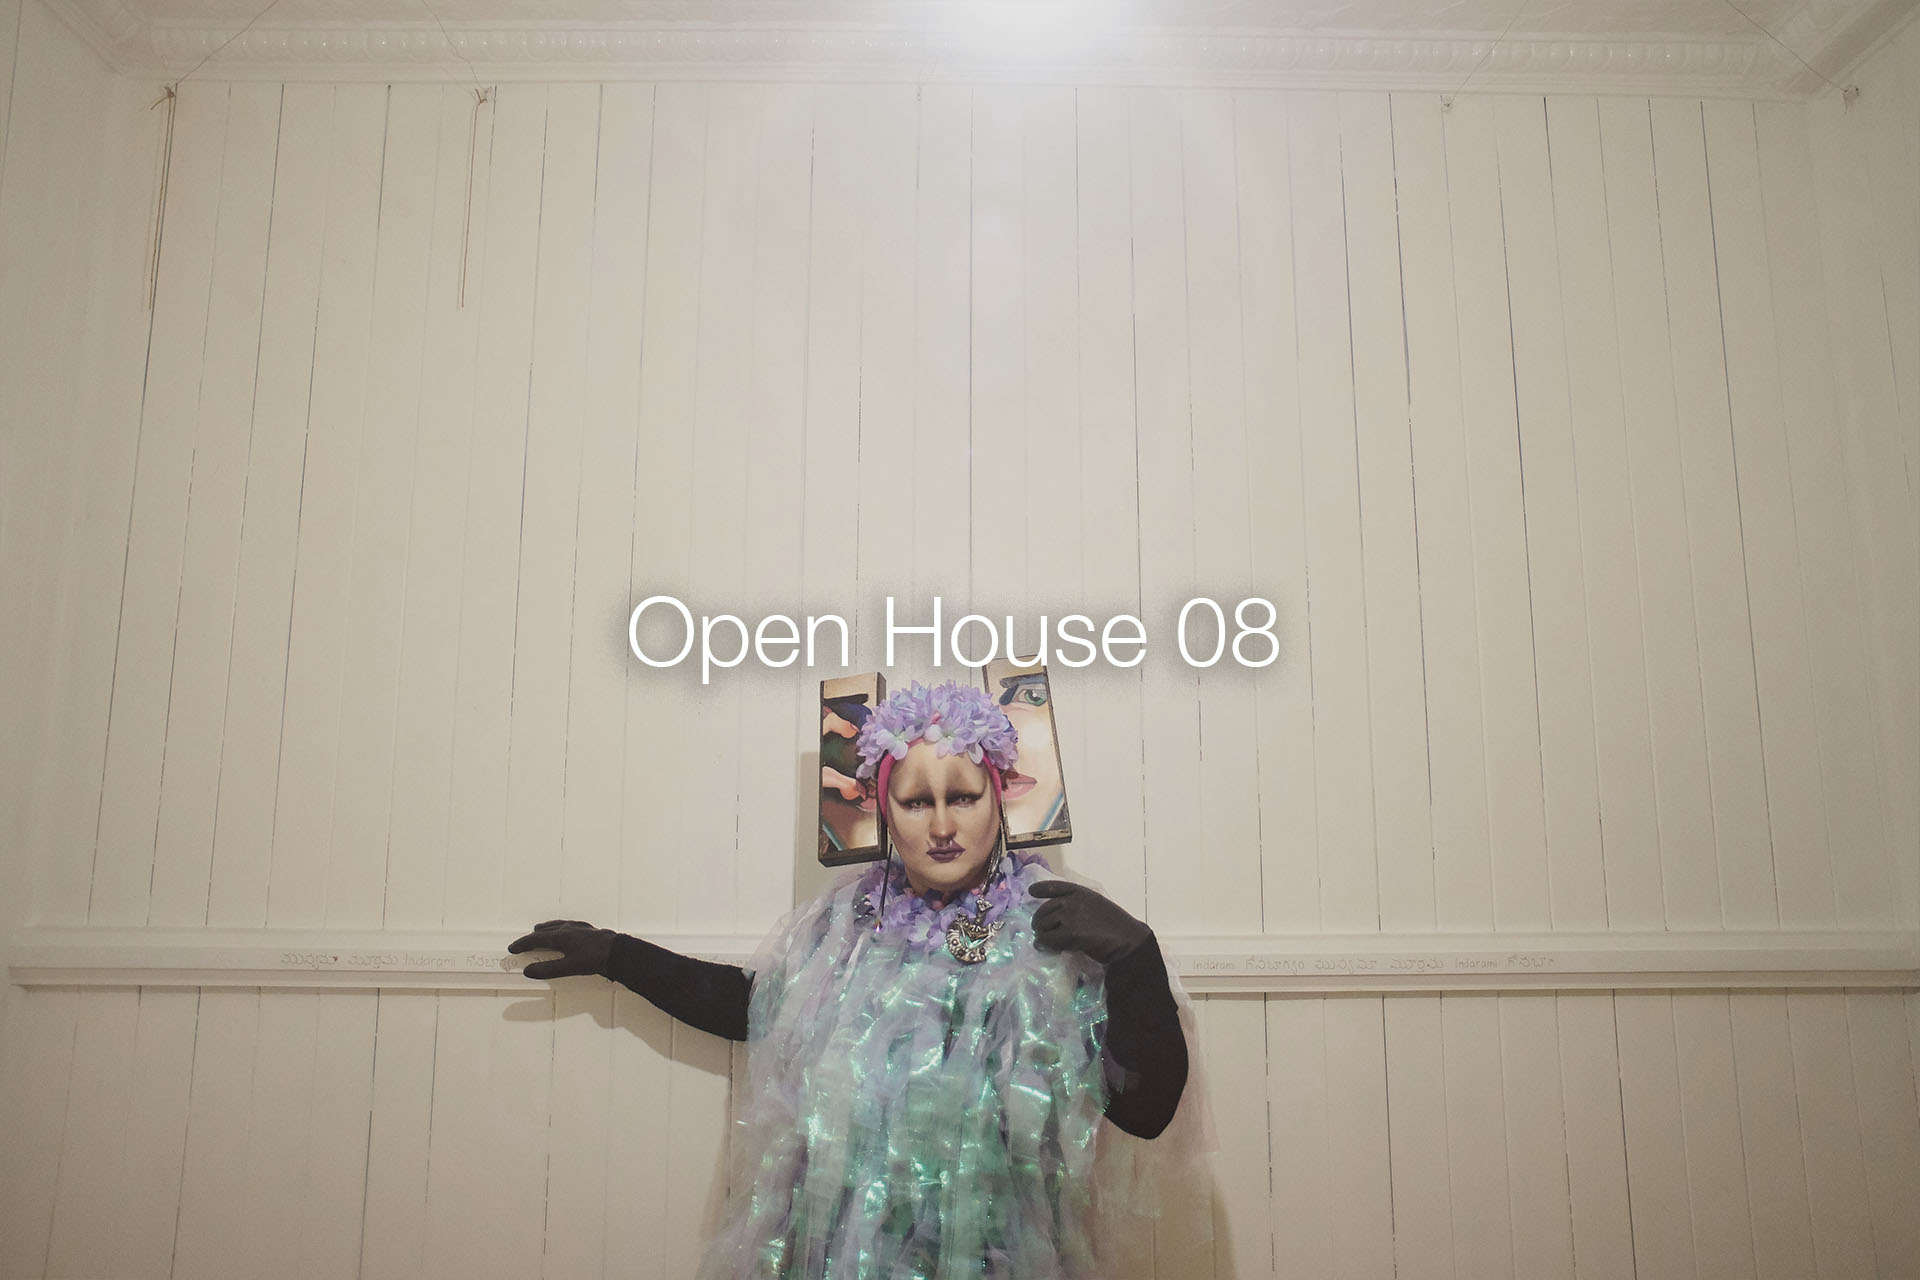 OpenHouse08.jpg